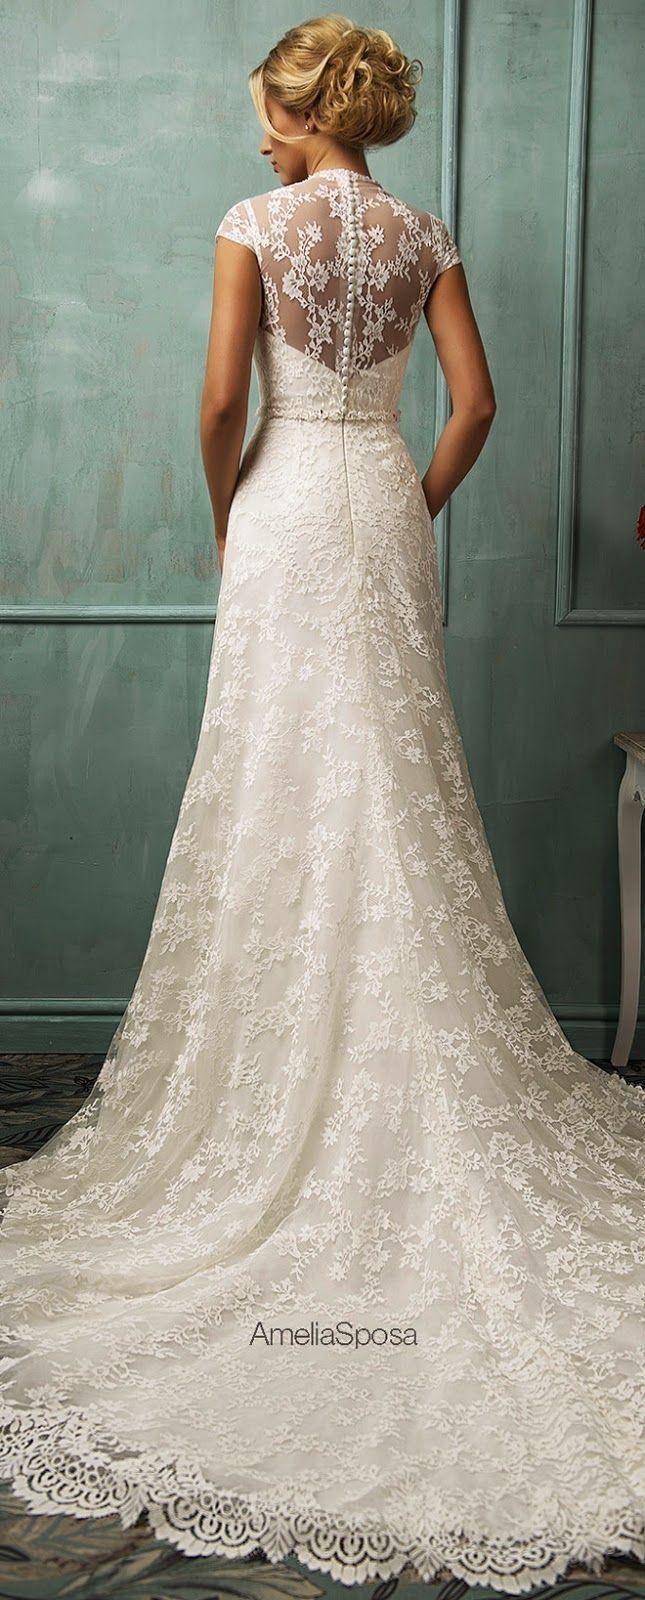 Lace wedding dress cheap december 2018 Amelia Sposa  Wedding Dresses  Secret  Pinterest  Amelia